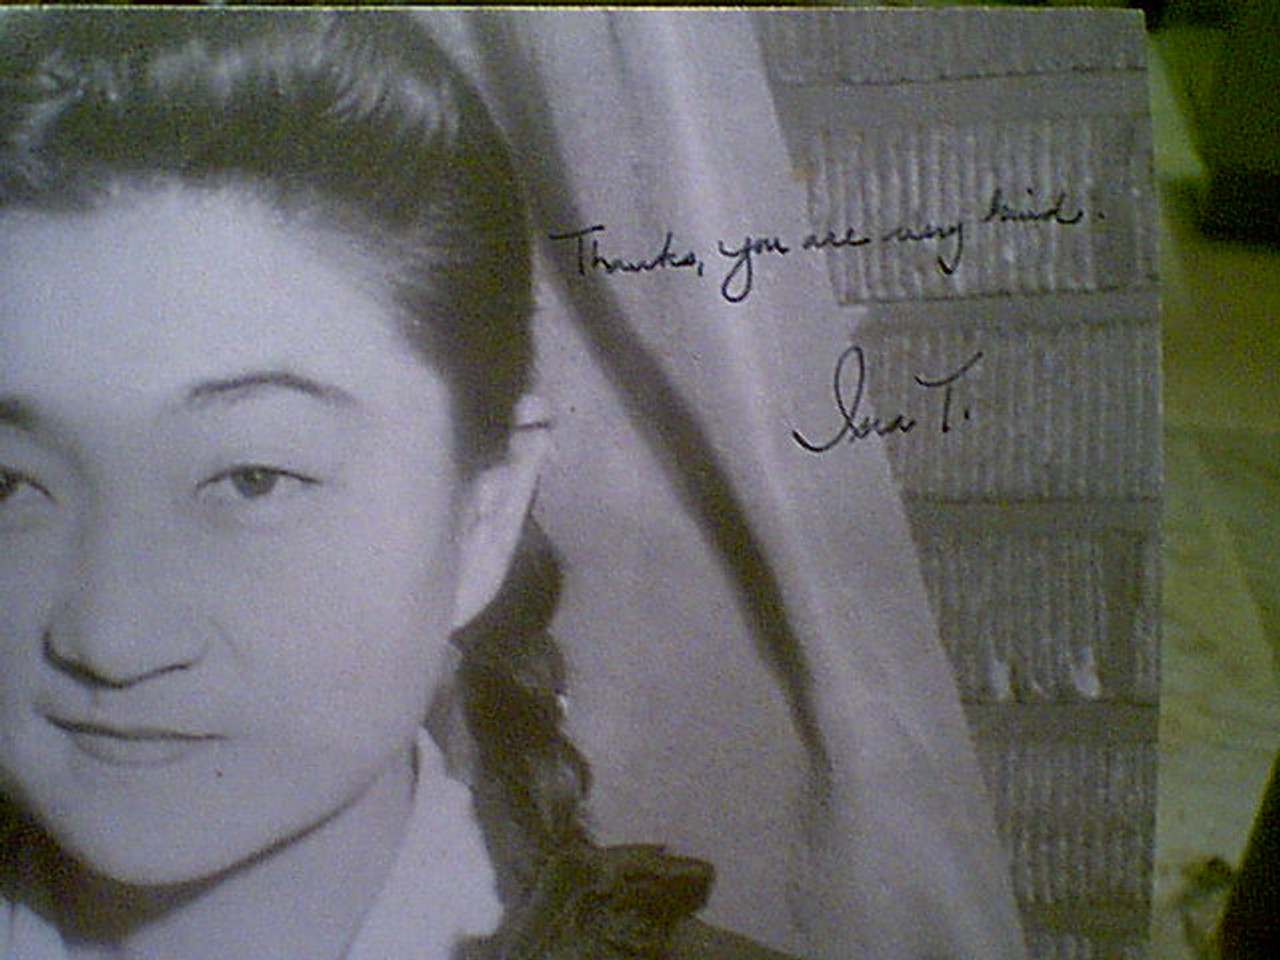 Tokyo Rose Iva Toguri Early Photo Signed Autograph Ww Ii